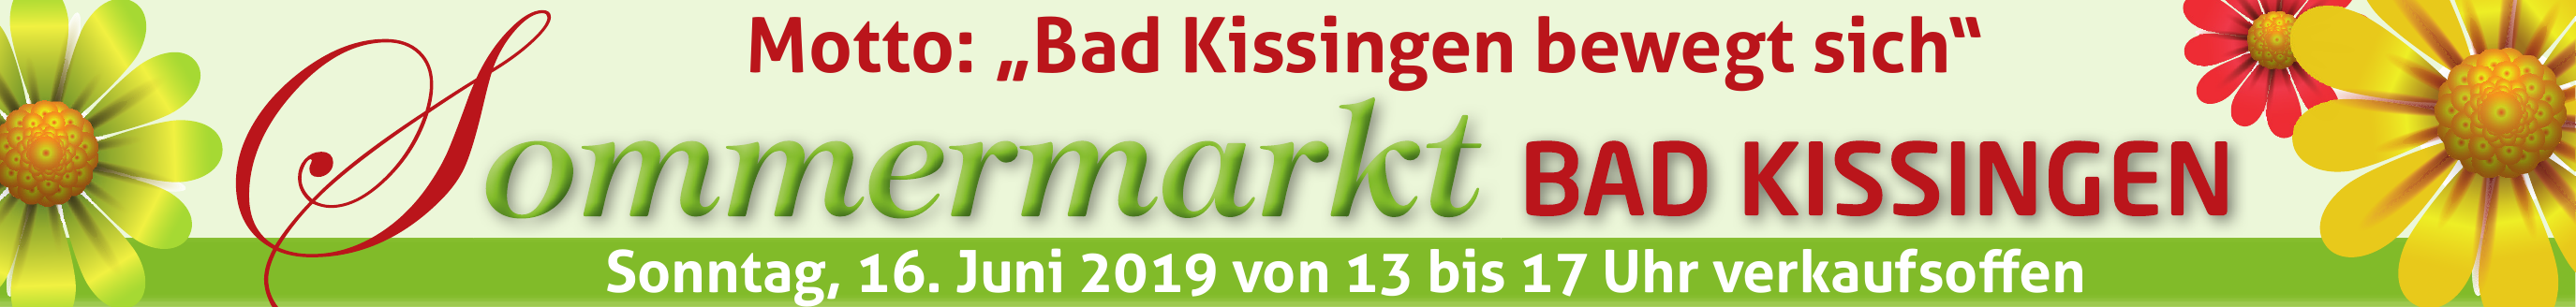 Bad Kissingen bewegt sich Image 1